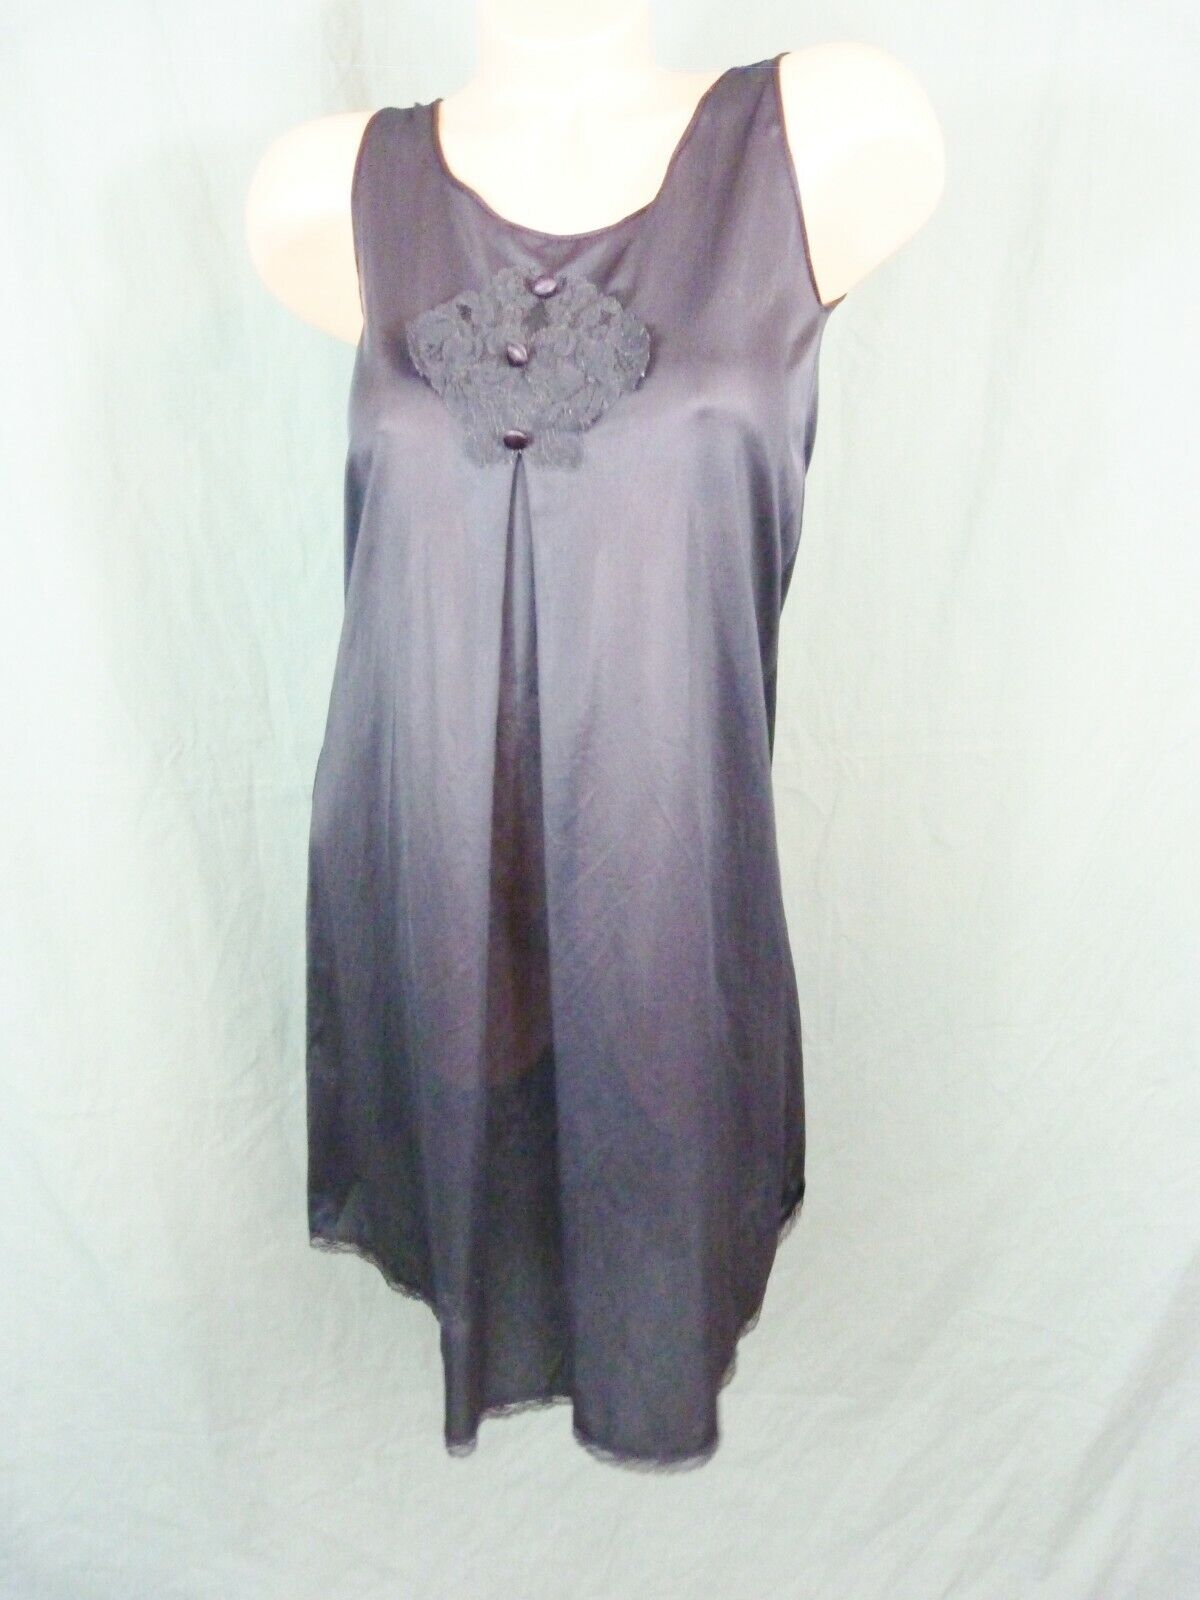 Texsheen Size Medium Full Slip Nightgown - image 3